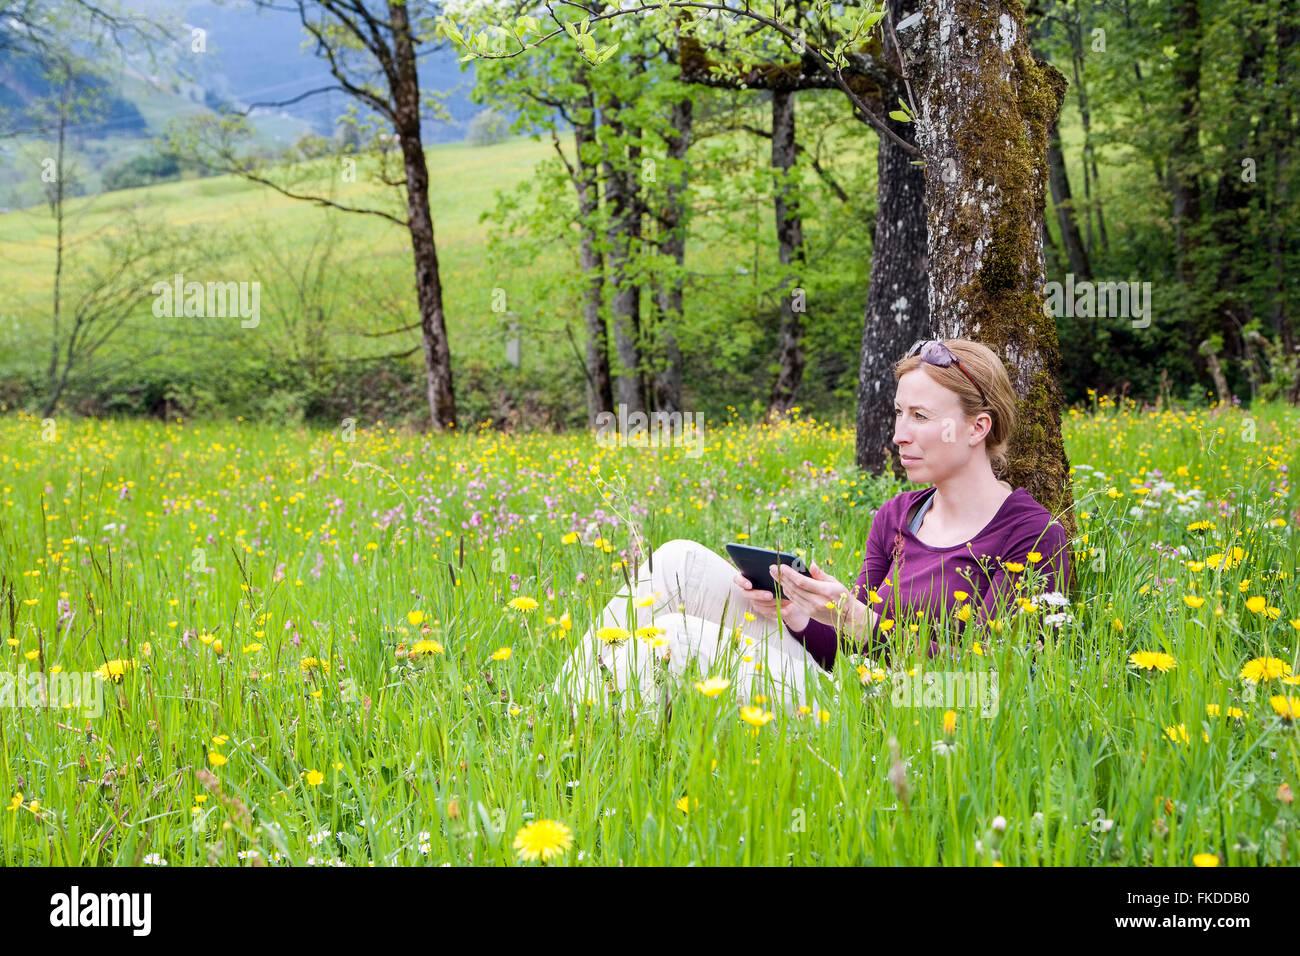 Femme à l'aide de e-reader in meadow Photo Stock